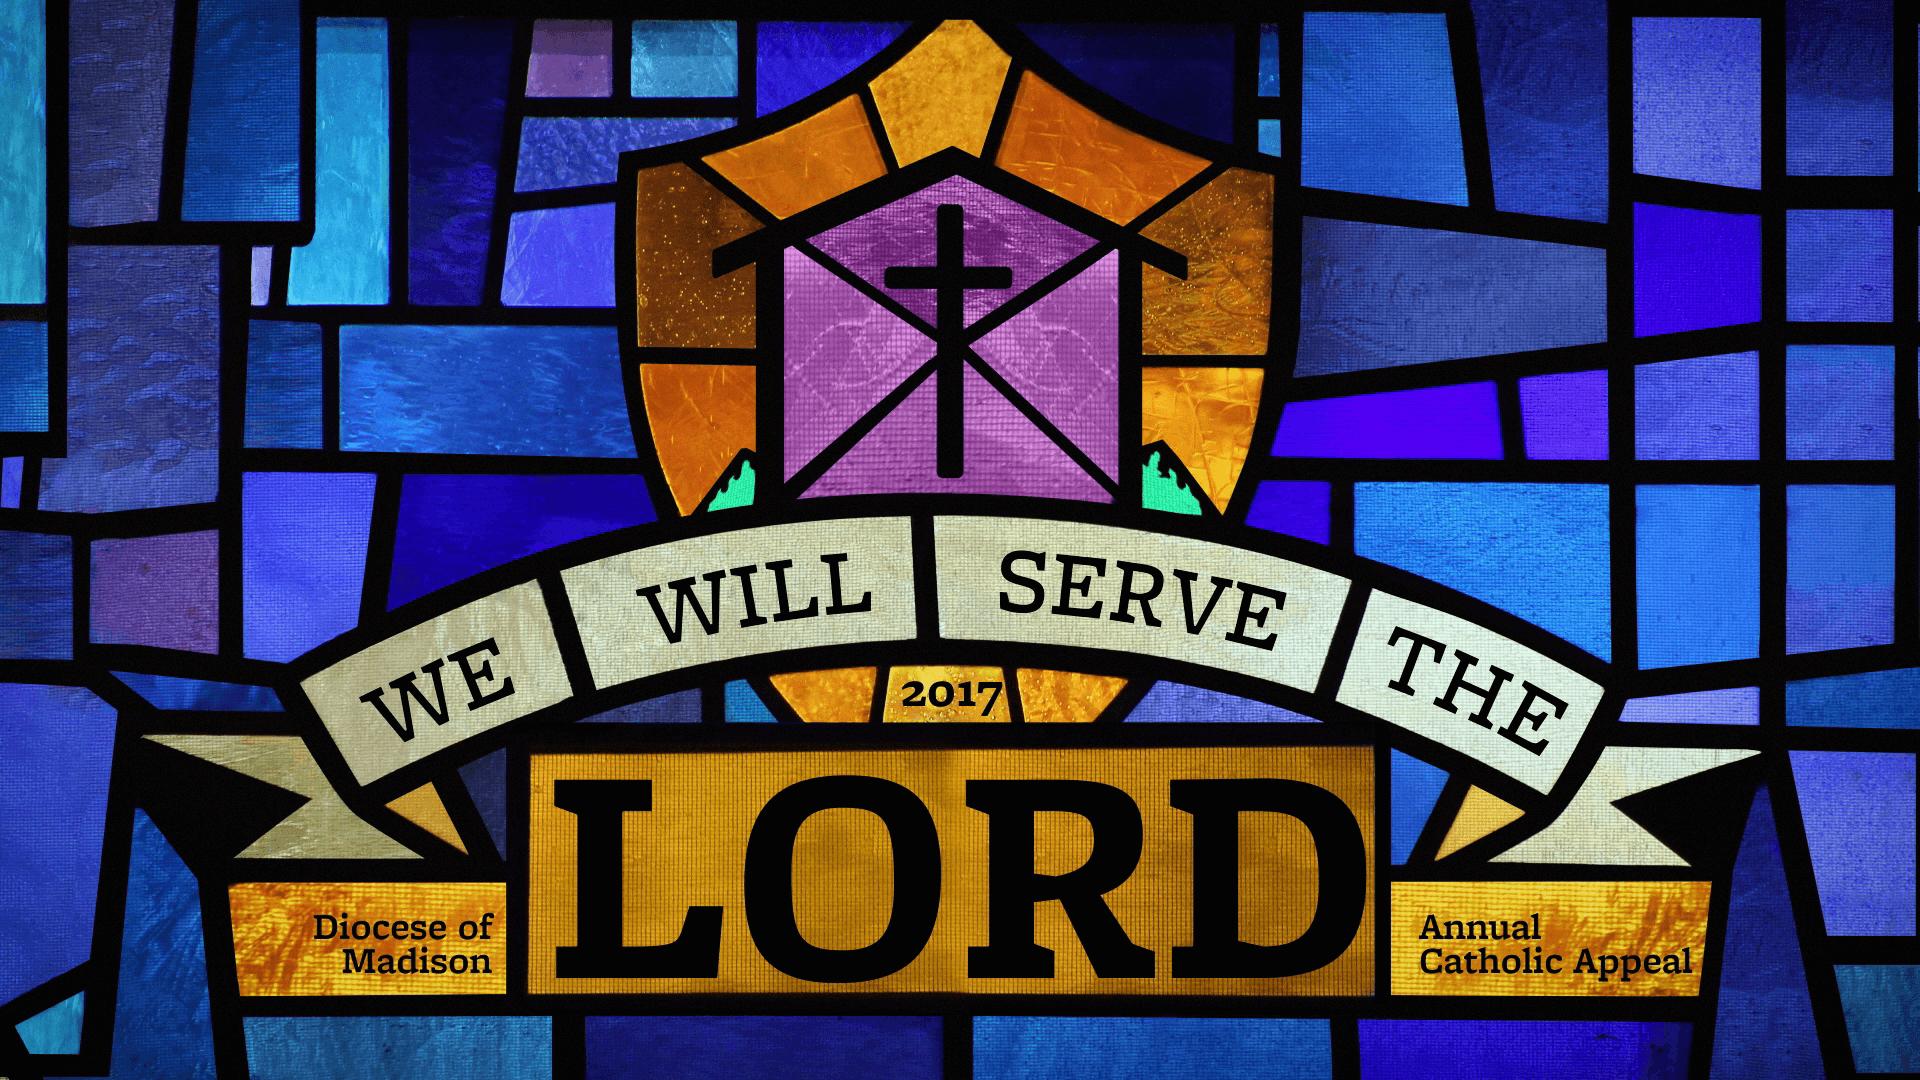 Annual Catholic Appeal